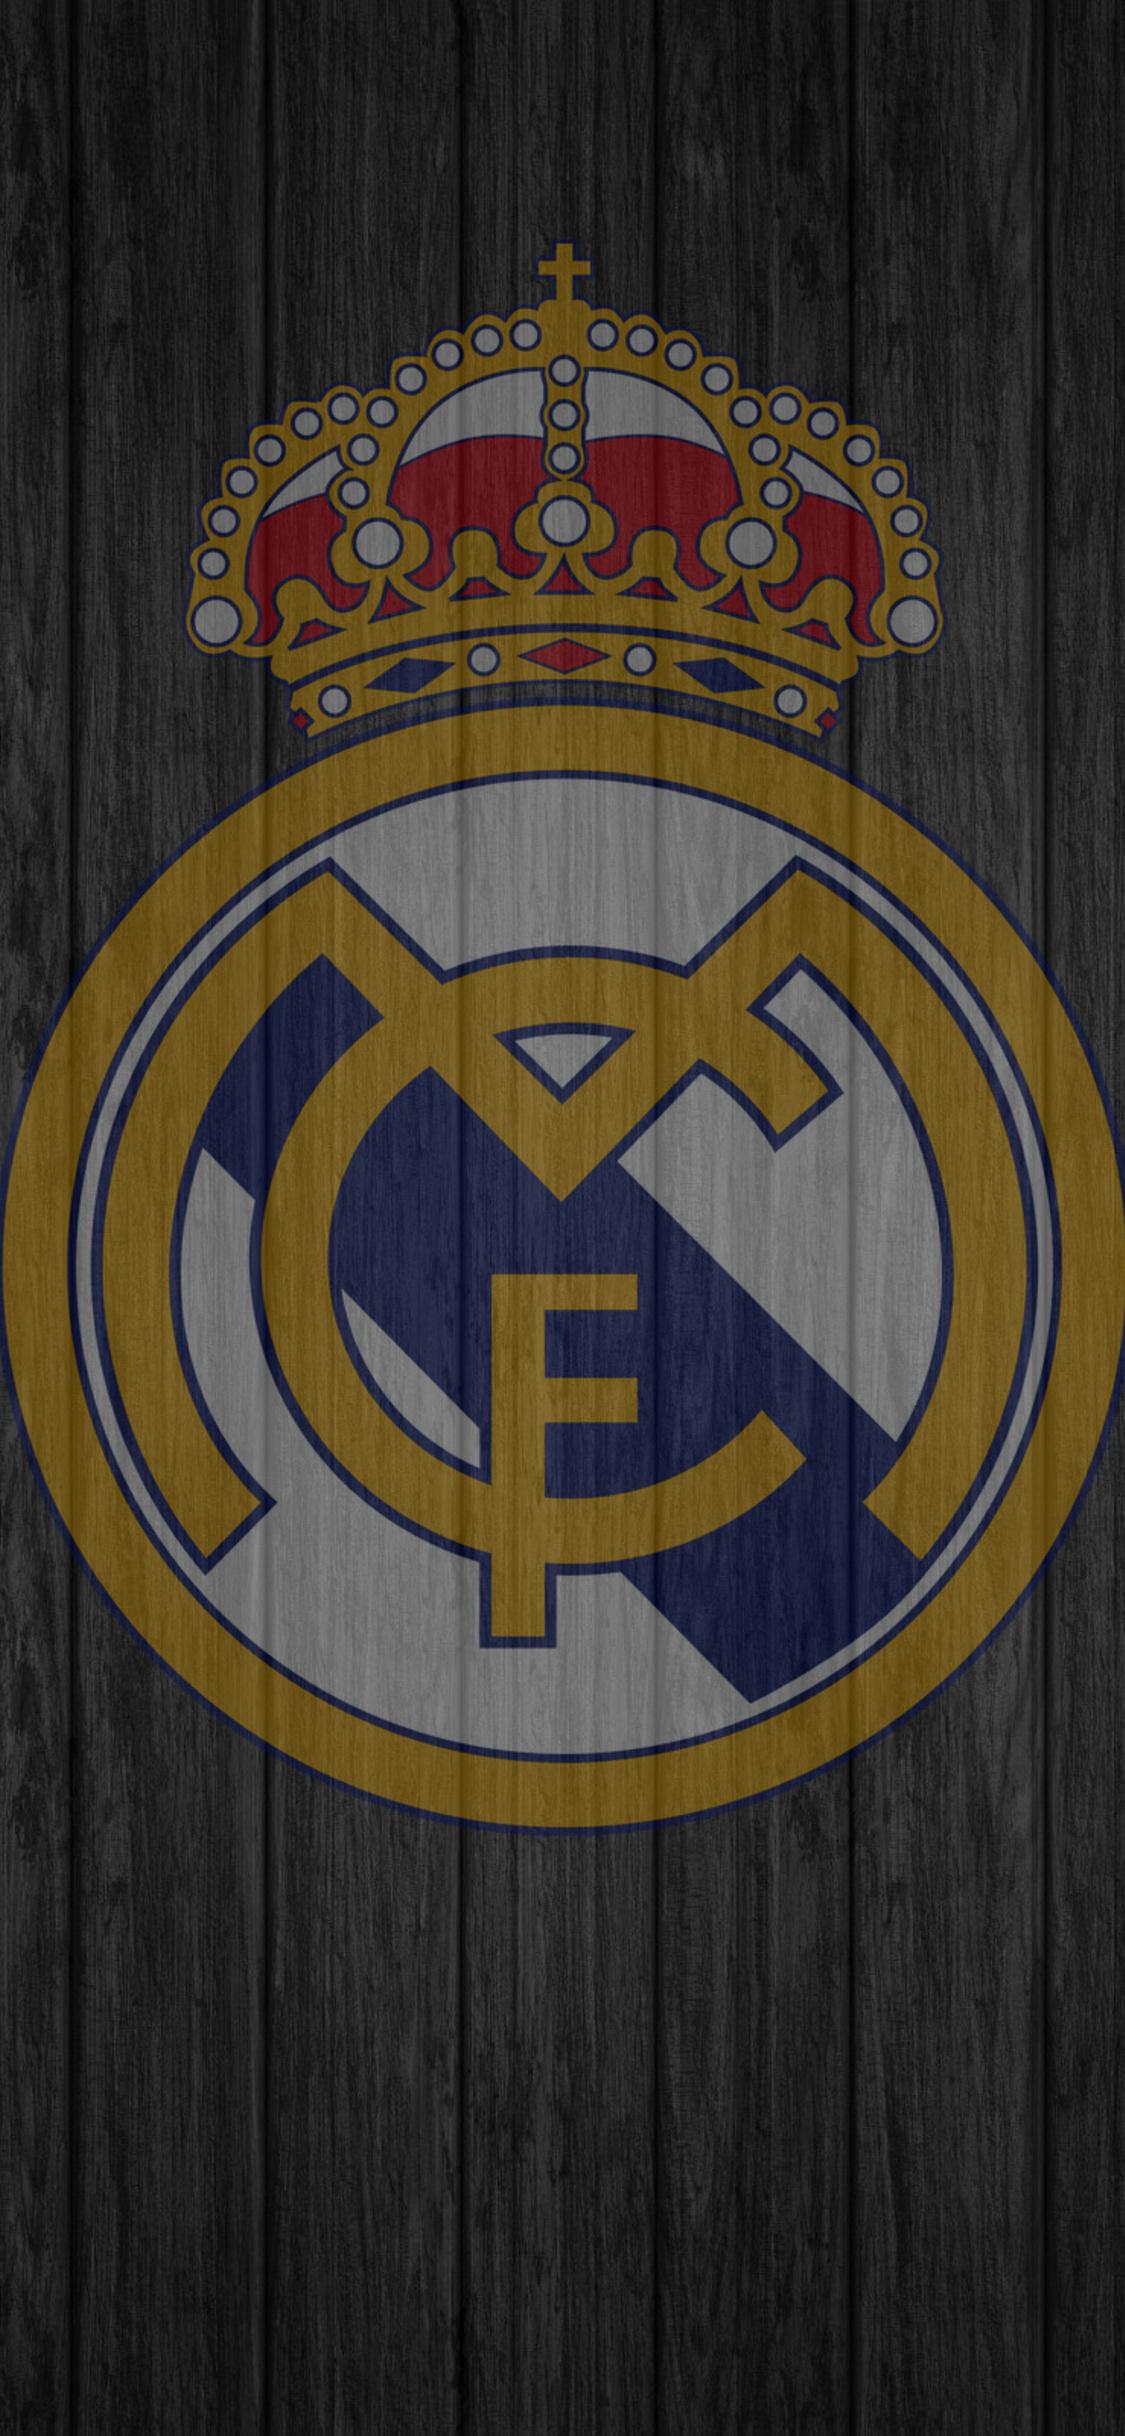 1125x2436 Real Madrid Cf Iphone Xs Iphone 10 Iphone X Hd 4k